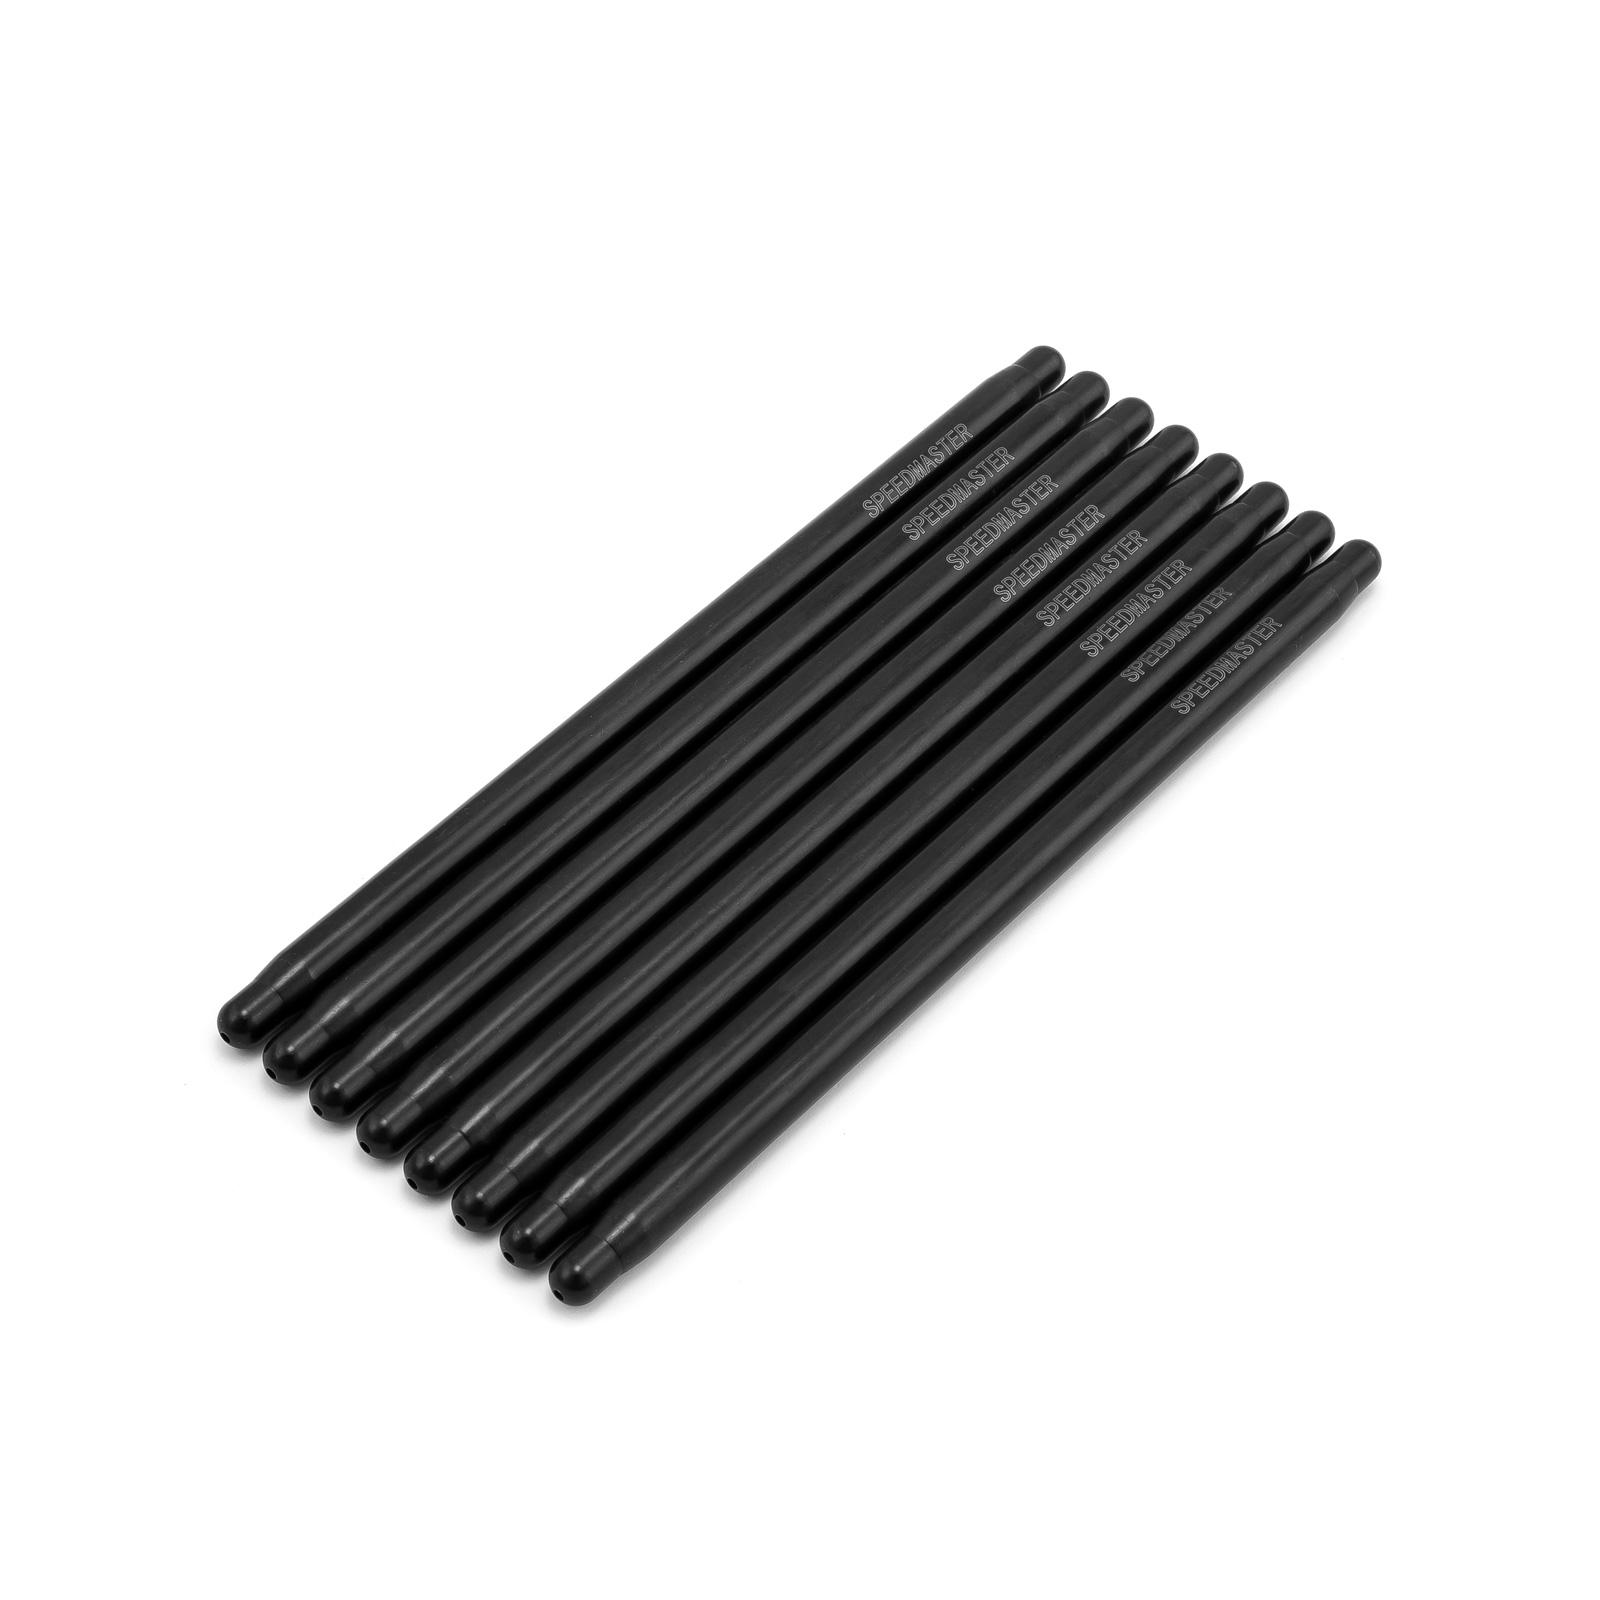 "7.400"" Chromoly Heat-Treated 3/8"" 0.080"" Wall DNA® One-Piece Pushrods"